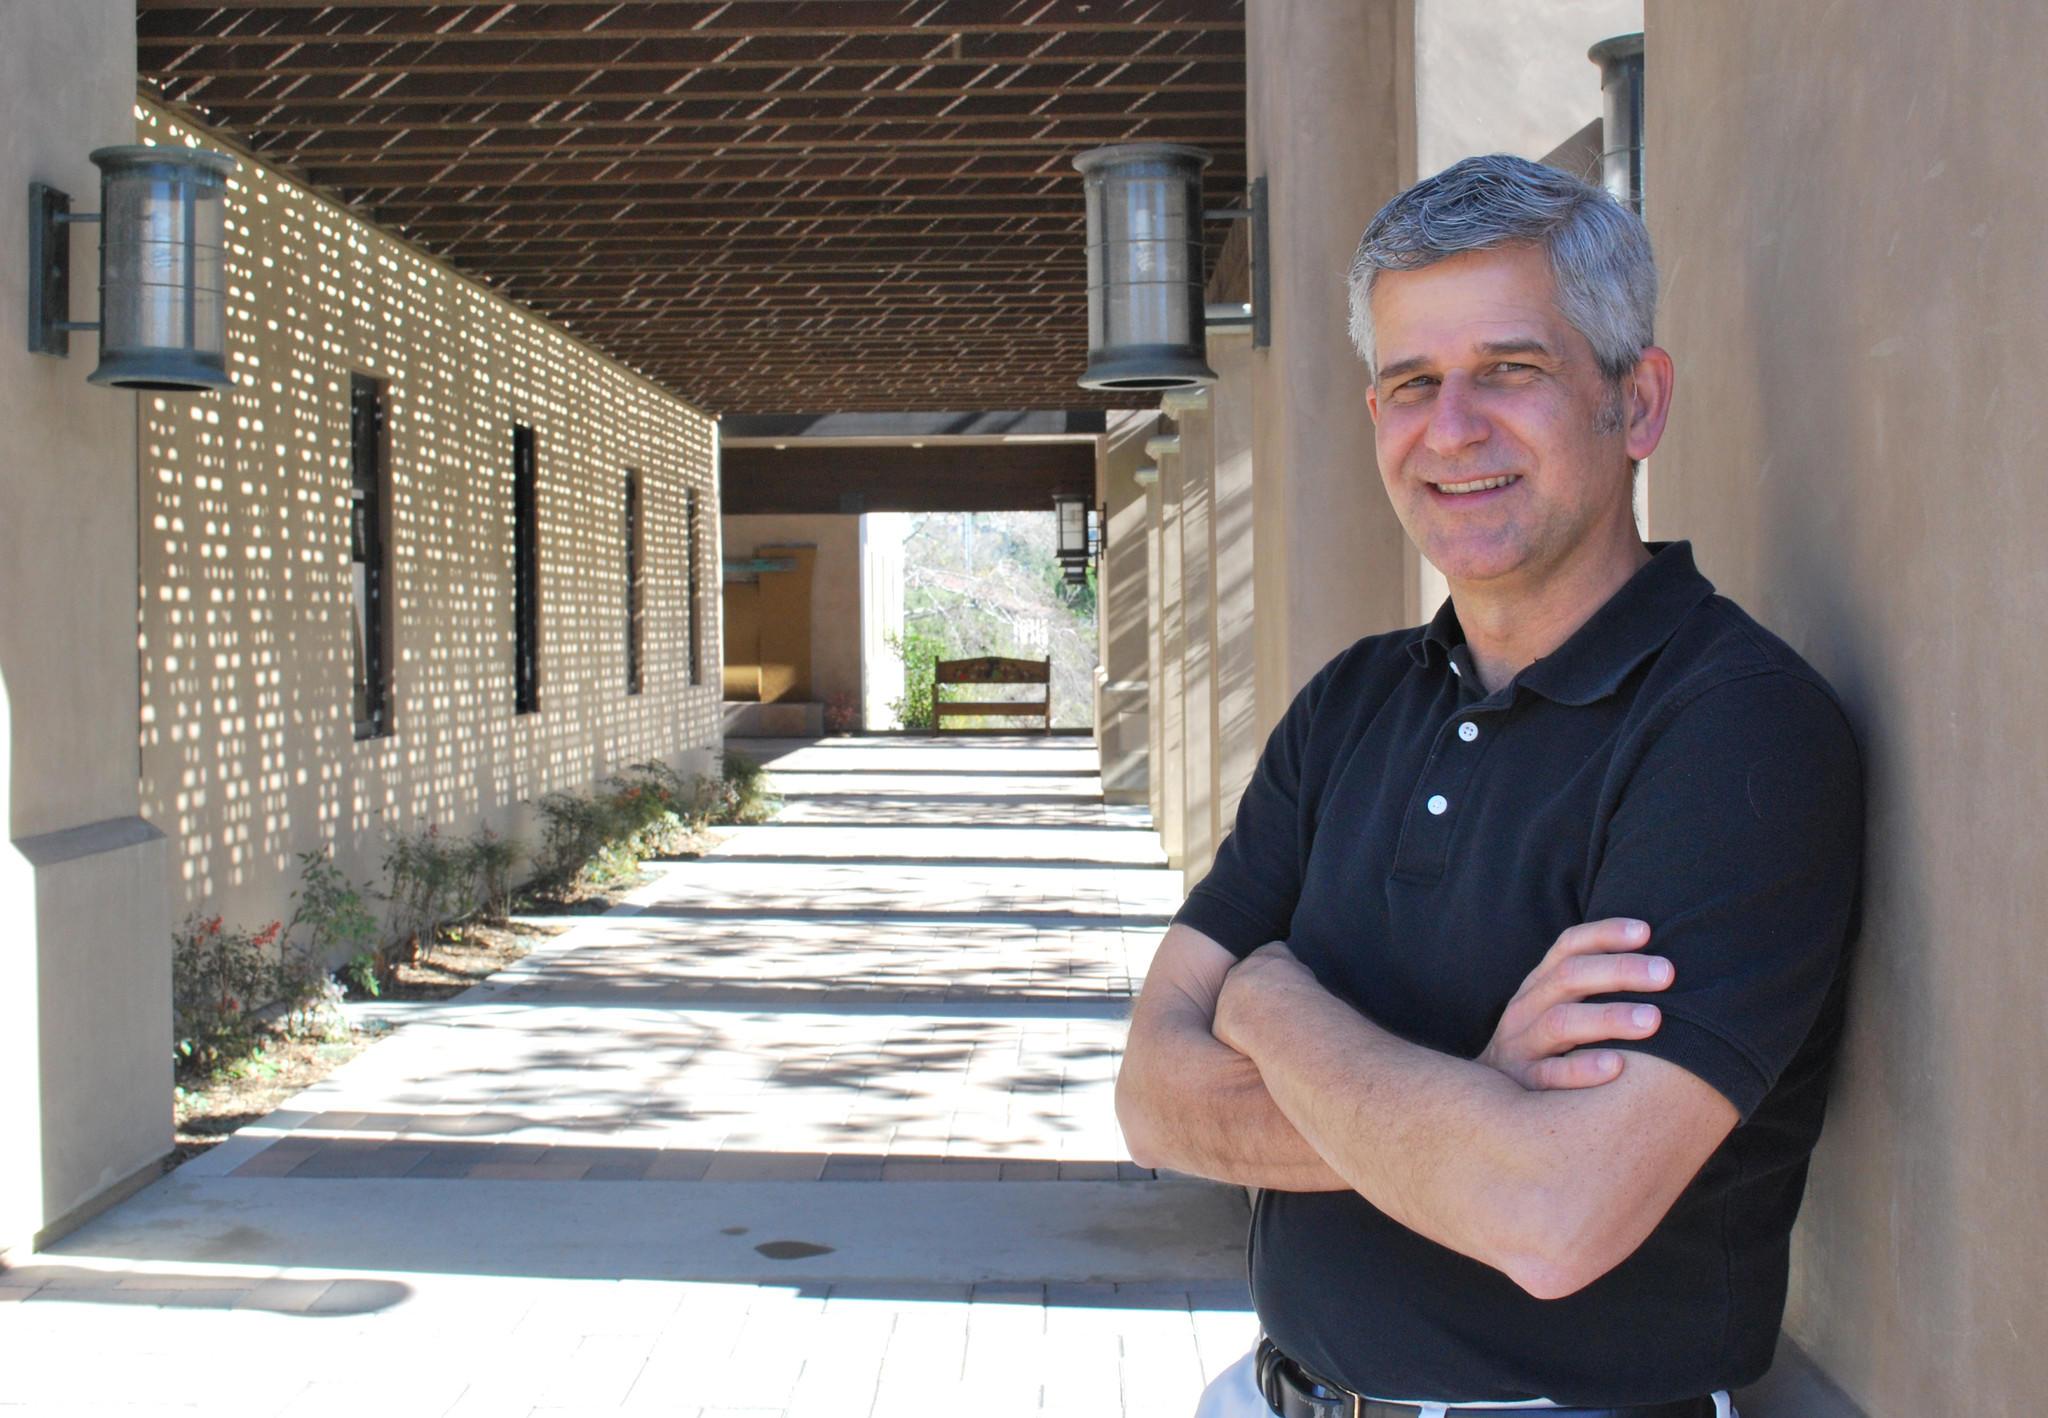 Rev. Dr. Mark Davis, new pastor at St. Mark Presbyterian Church in Newport Beach.